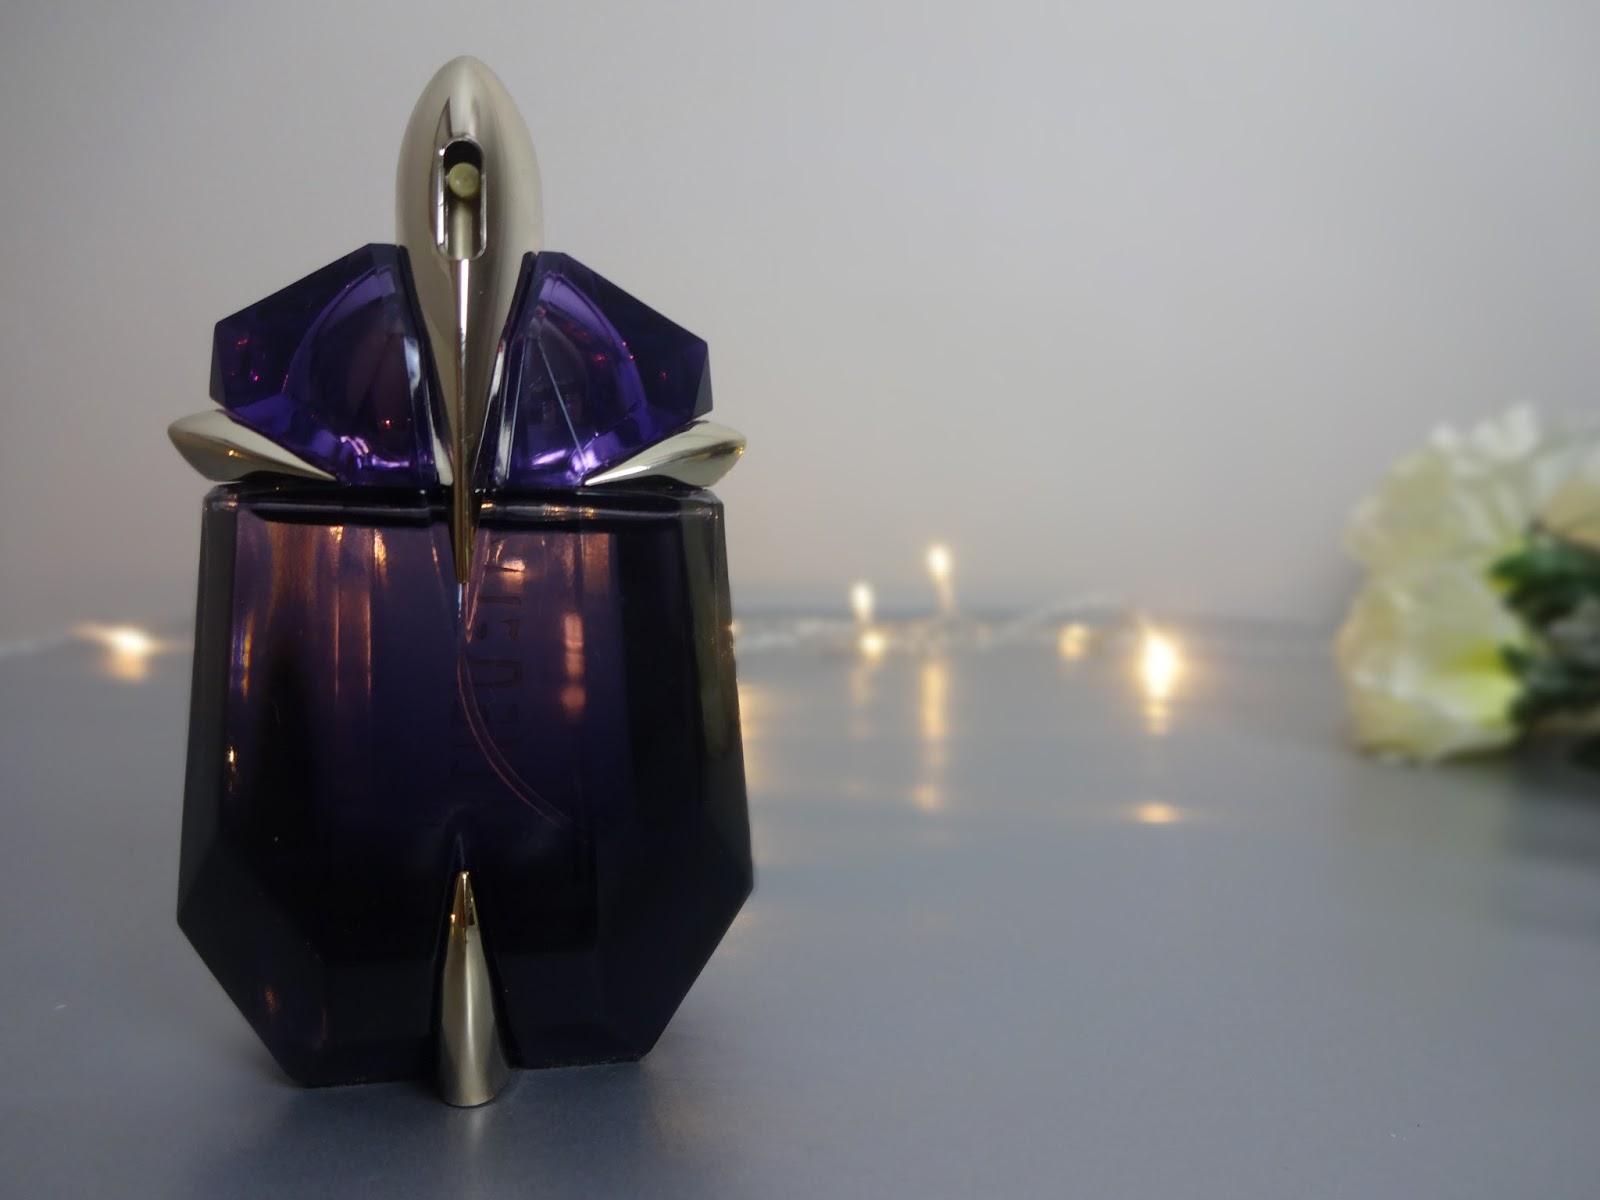 Alien Thierry Mugler Perfume Review Laura Bora